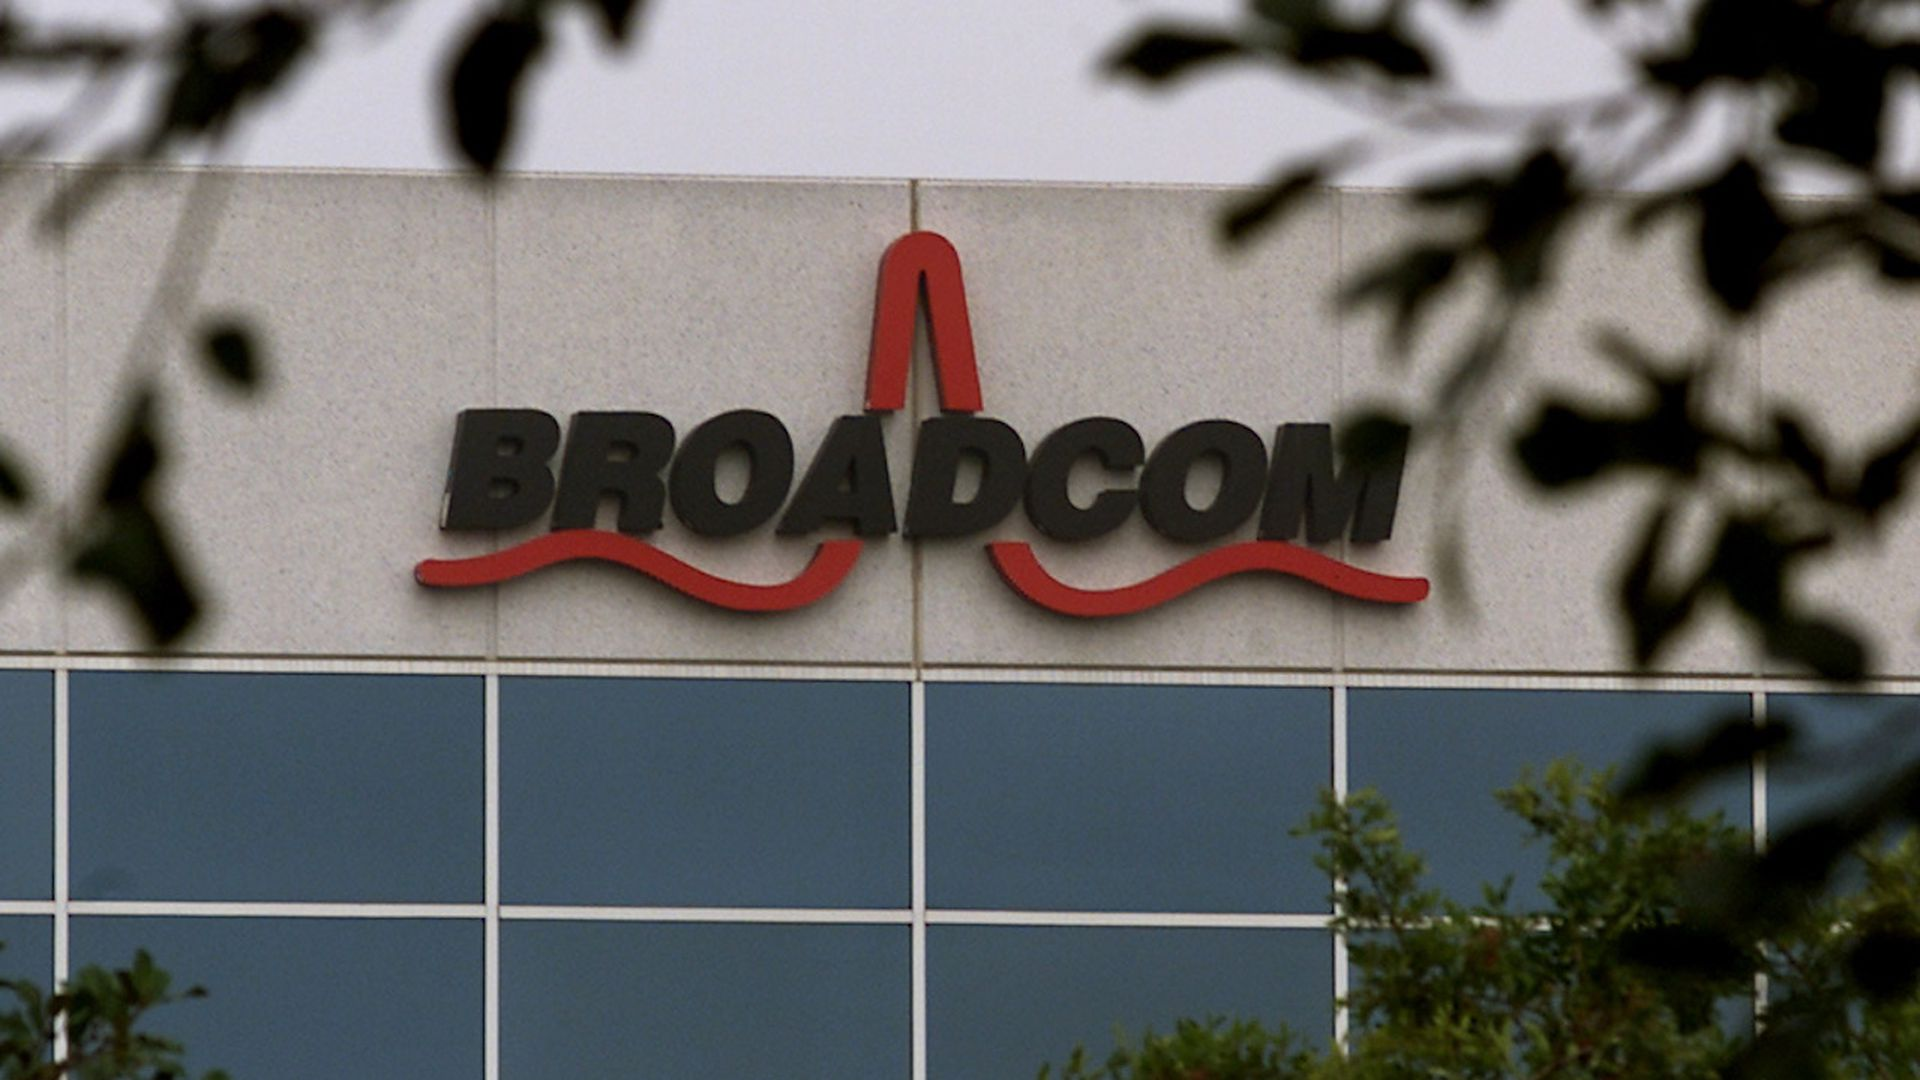 Broadcom - Axios